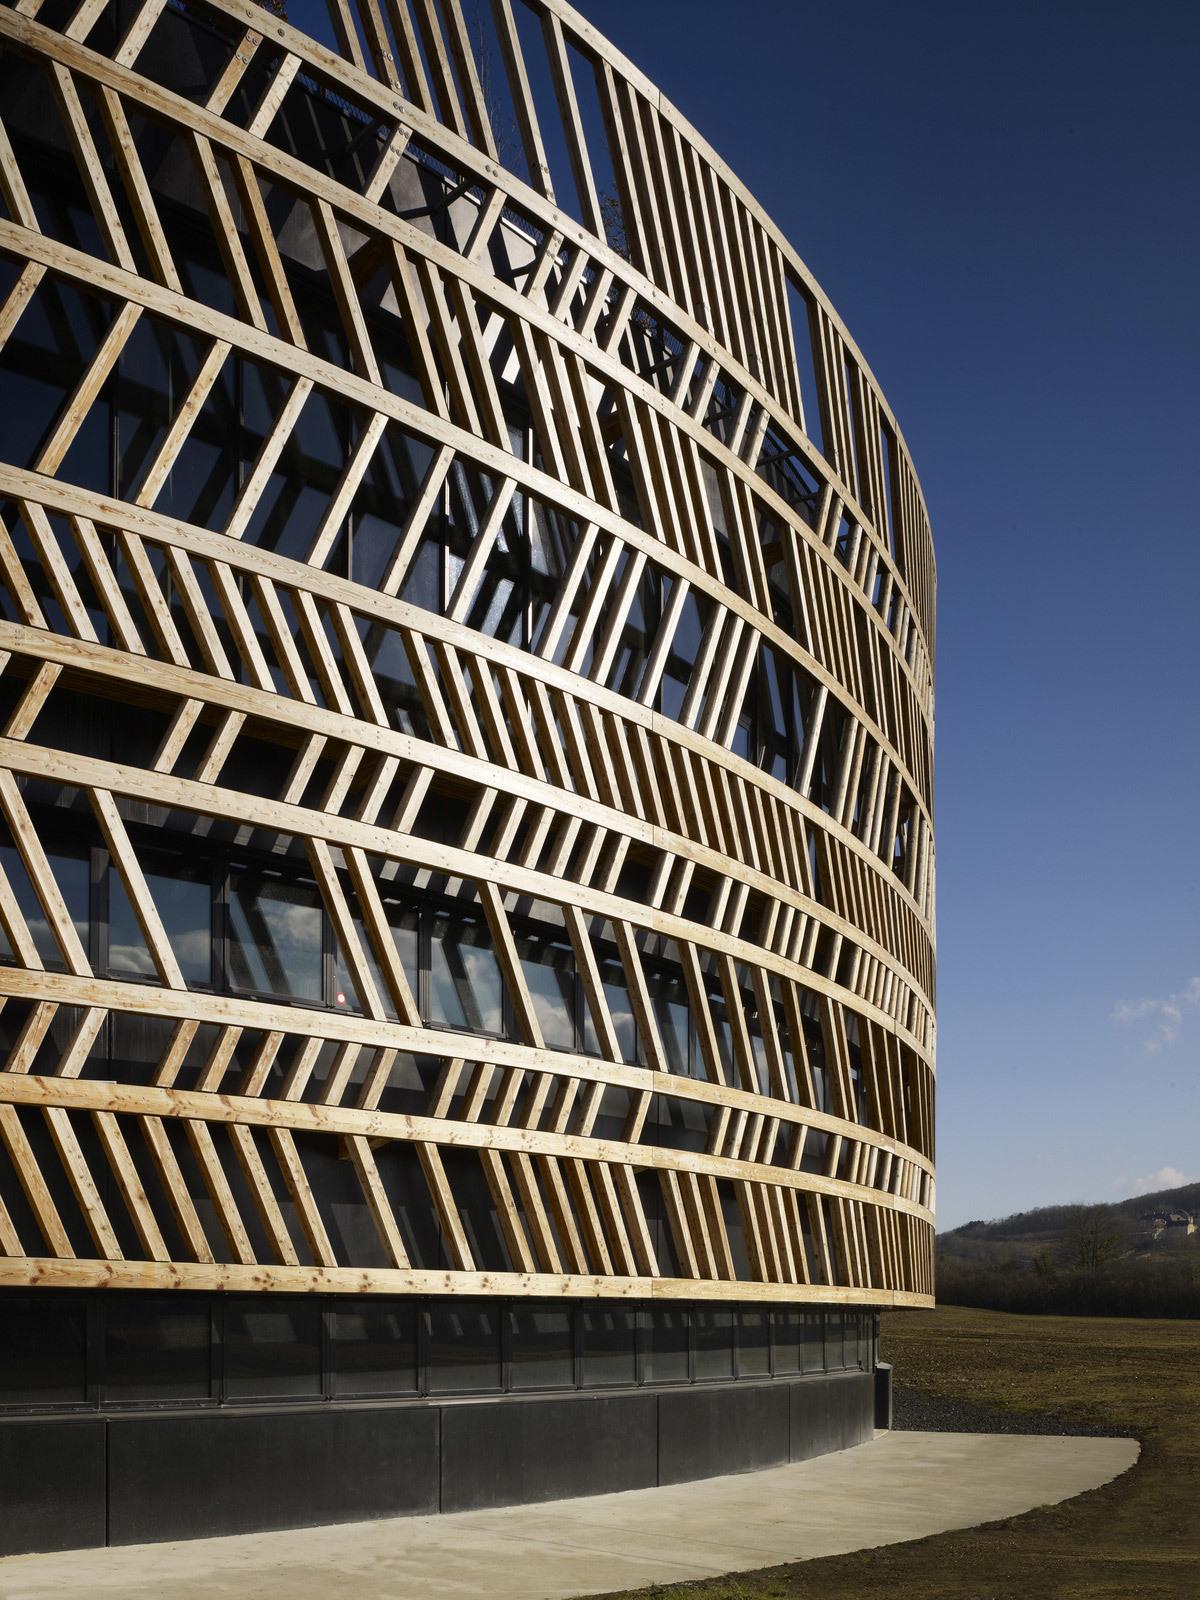 Alésia Museum in Alise-Sainte-Reine, France by Bernard Tschumi Architects (Photo: Christian Richters)